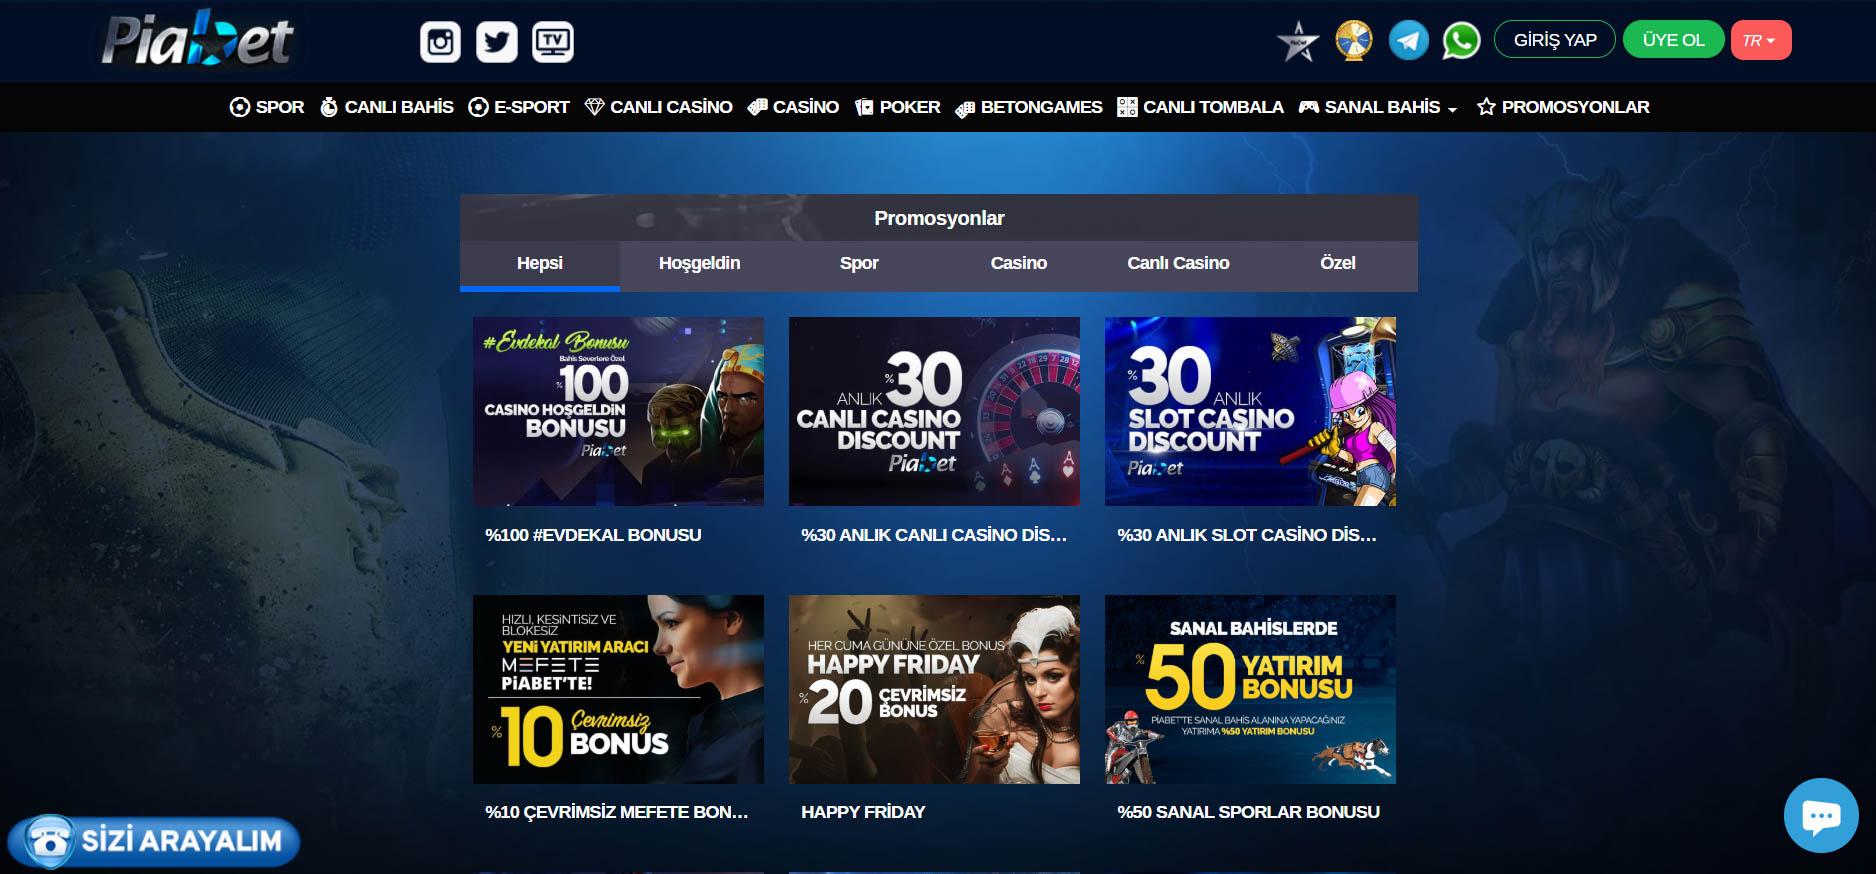 Piabet Canli Casino Sitesi